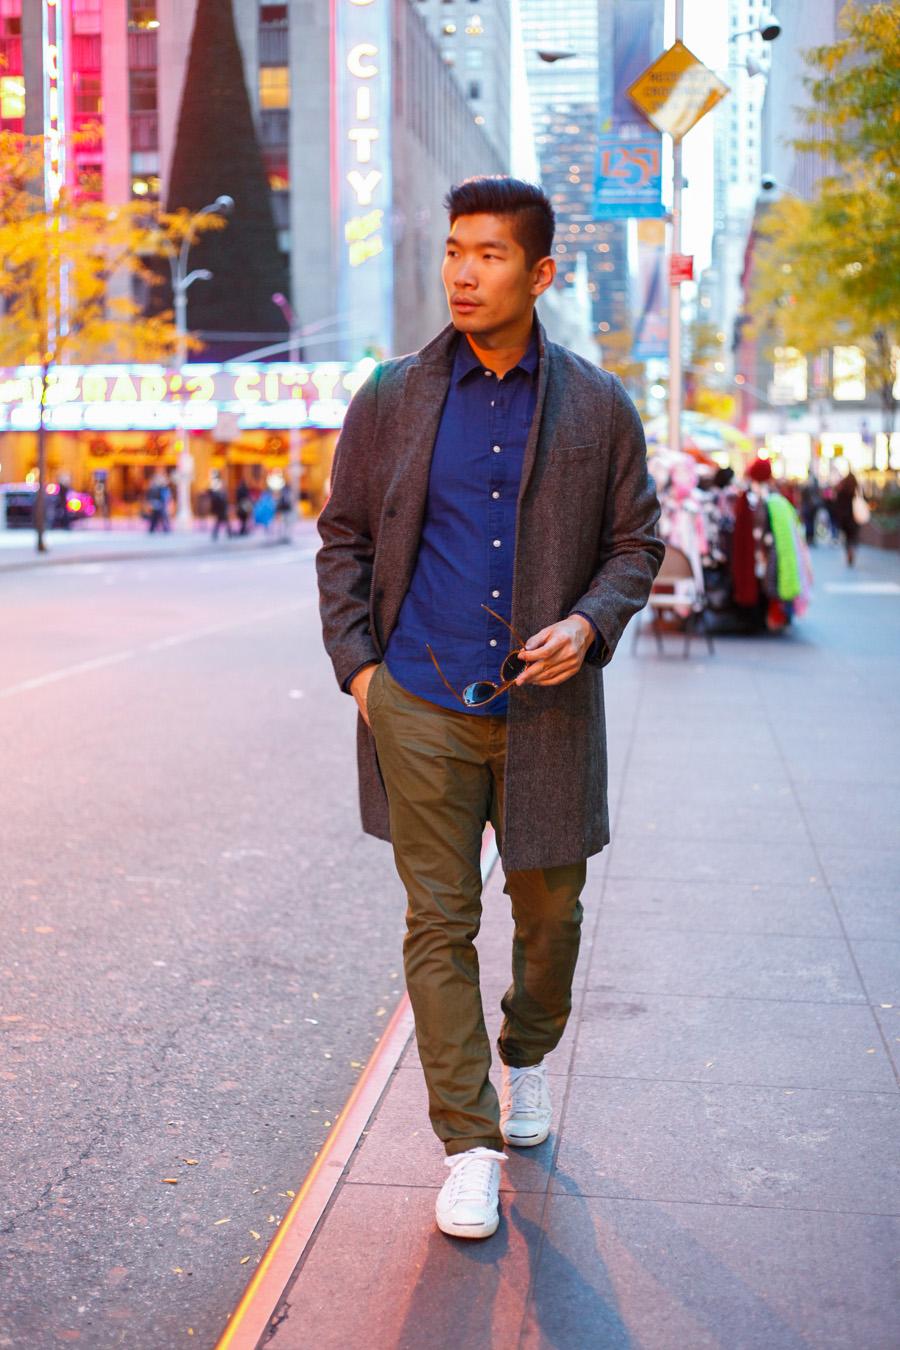 Levitate Style, Men's Style Lab, Leo Chan, Menswear, Tailored, GANT, BOGA, Scotch & Soda, Florsheim